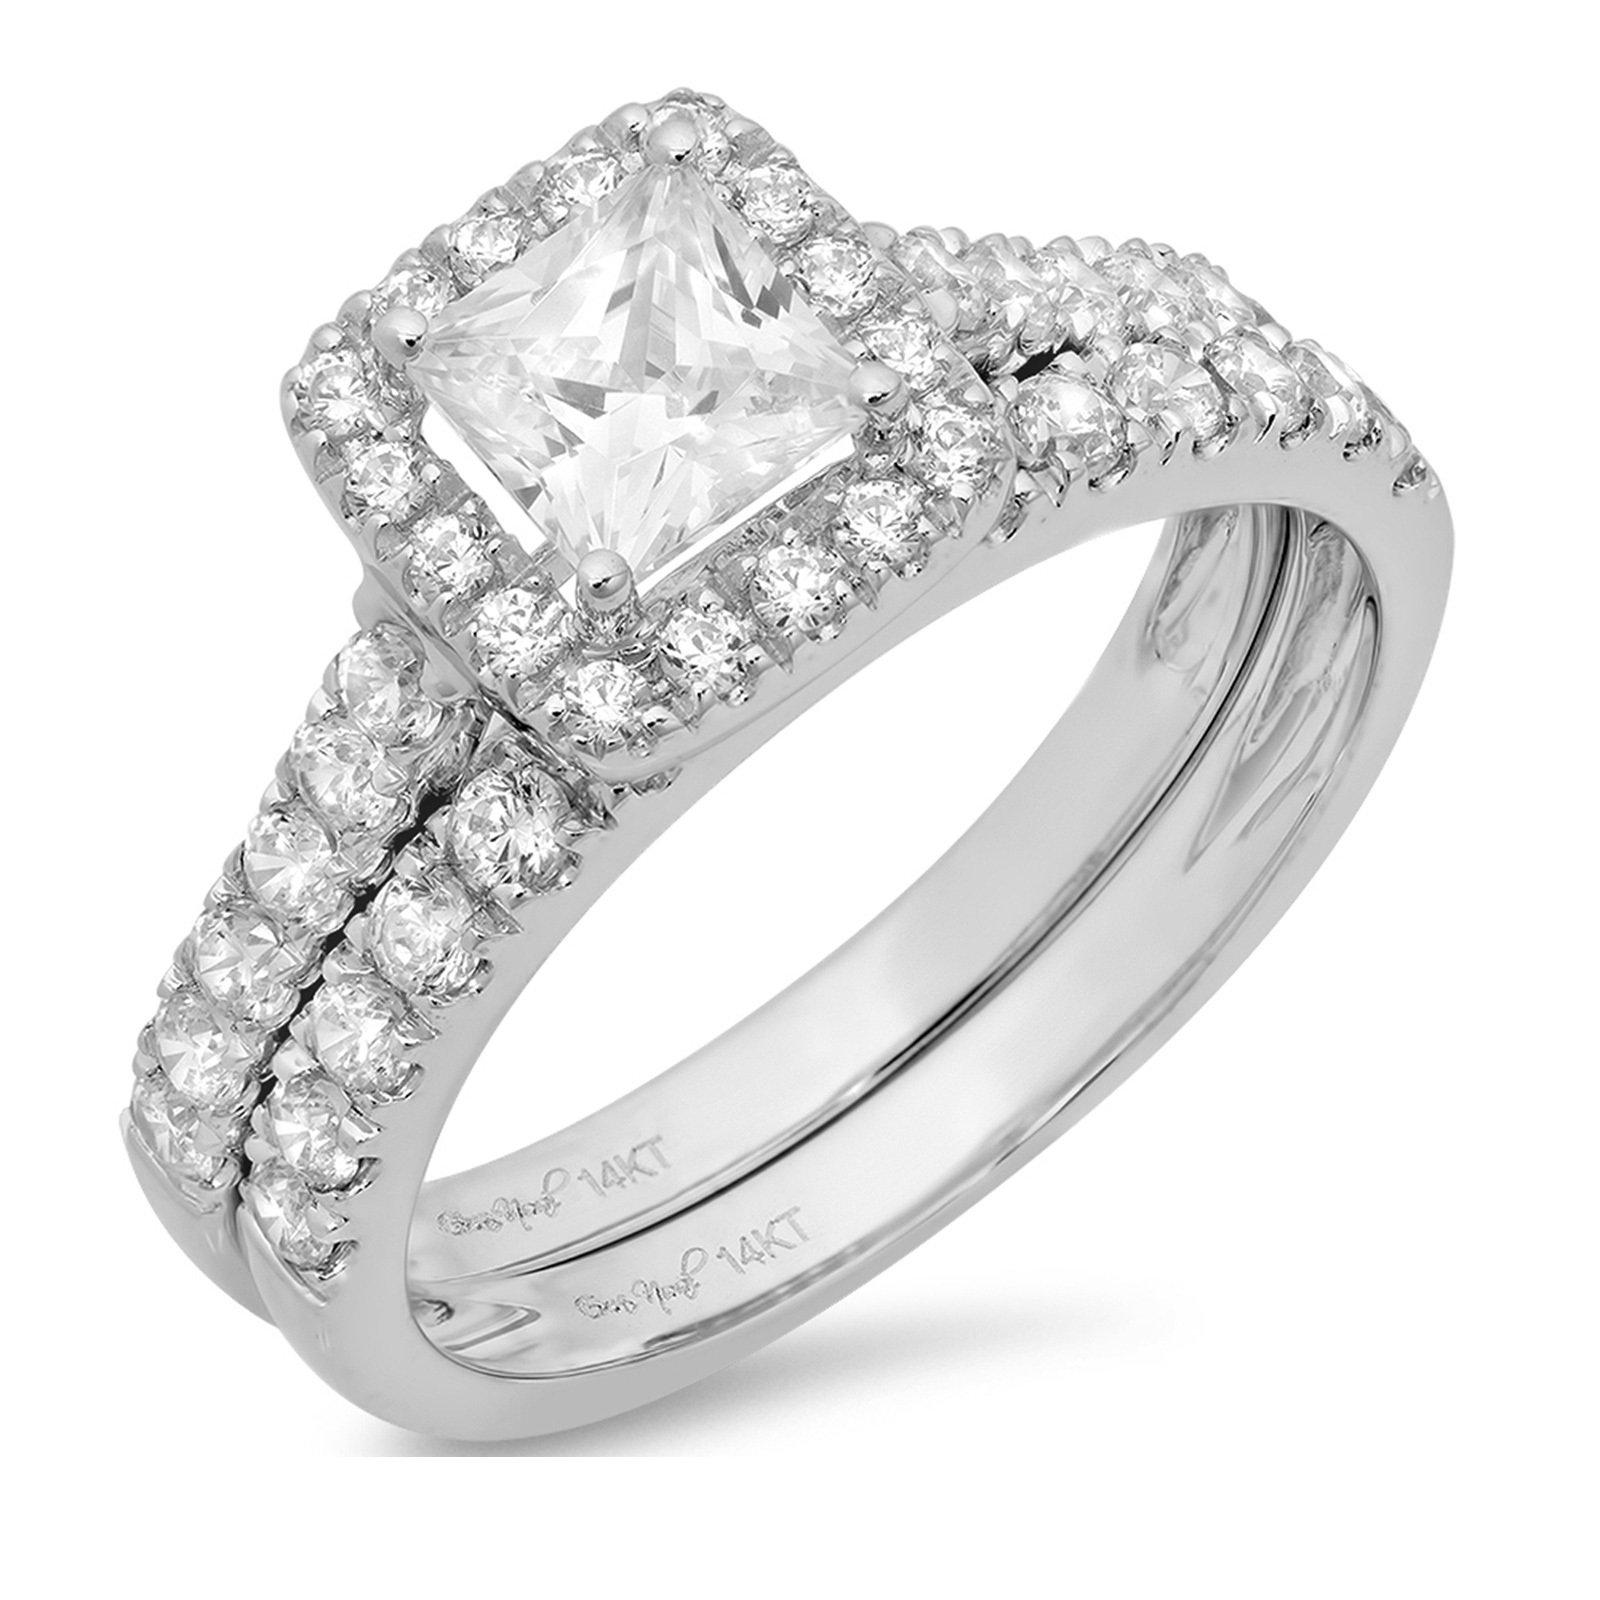 Clara Pucci 1.5 CT Princess Cut Pave Halo Bridal Engagement Wedding Ring band set 14k White Gold, Size 3.5